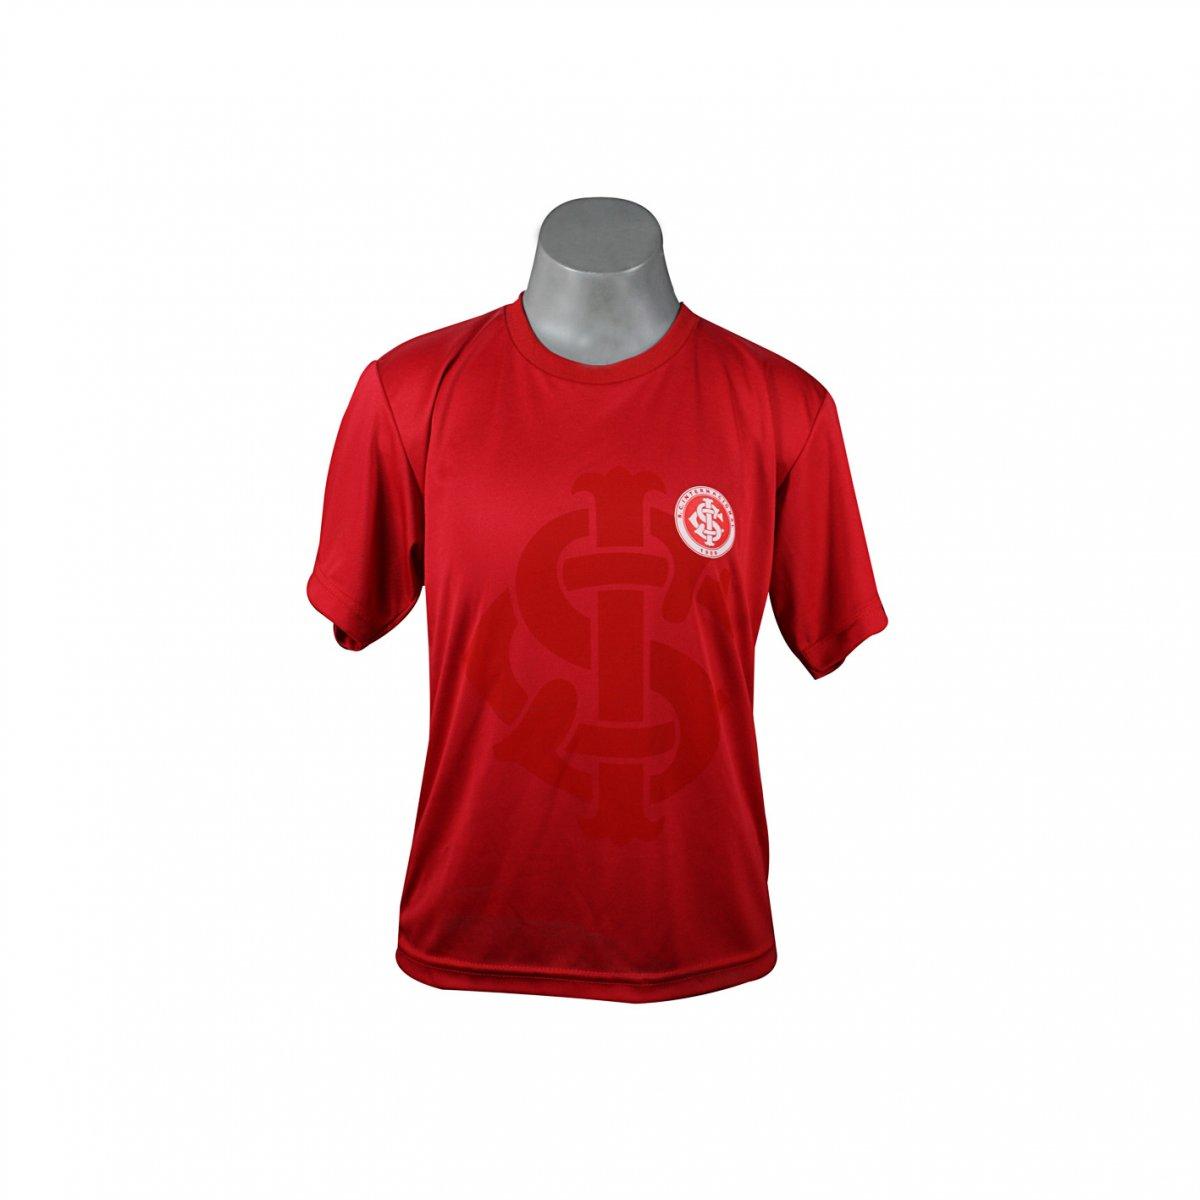 bf93b24b6bd55 Camiseta Infantil Inter Dilva Oldoni INT 4351 Vermelho